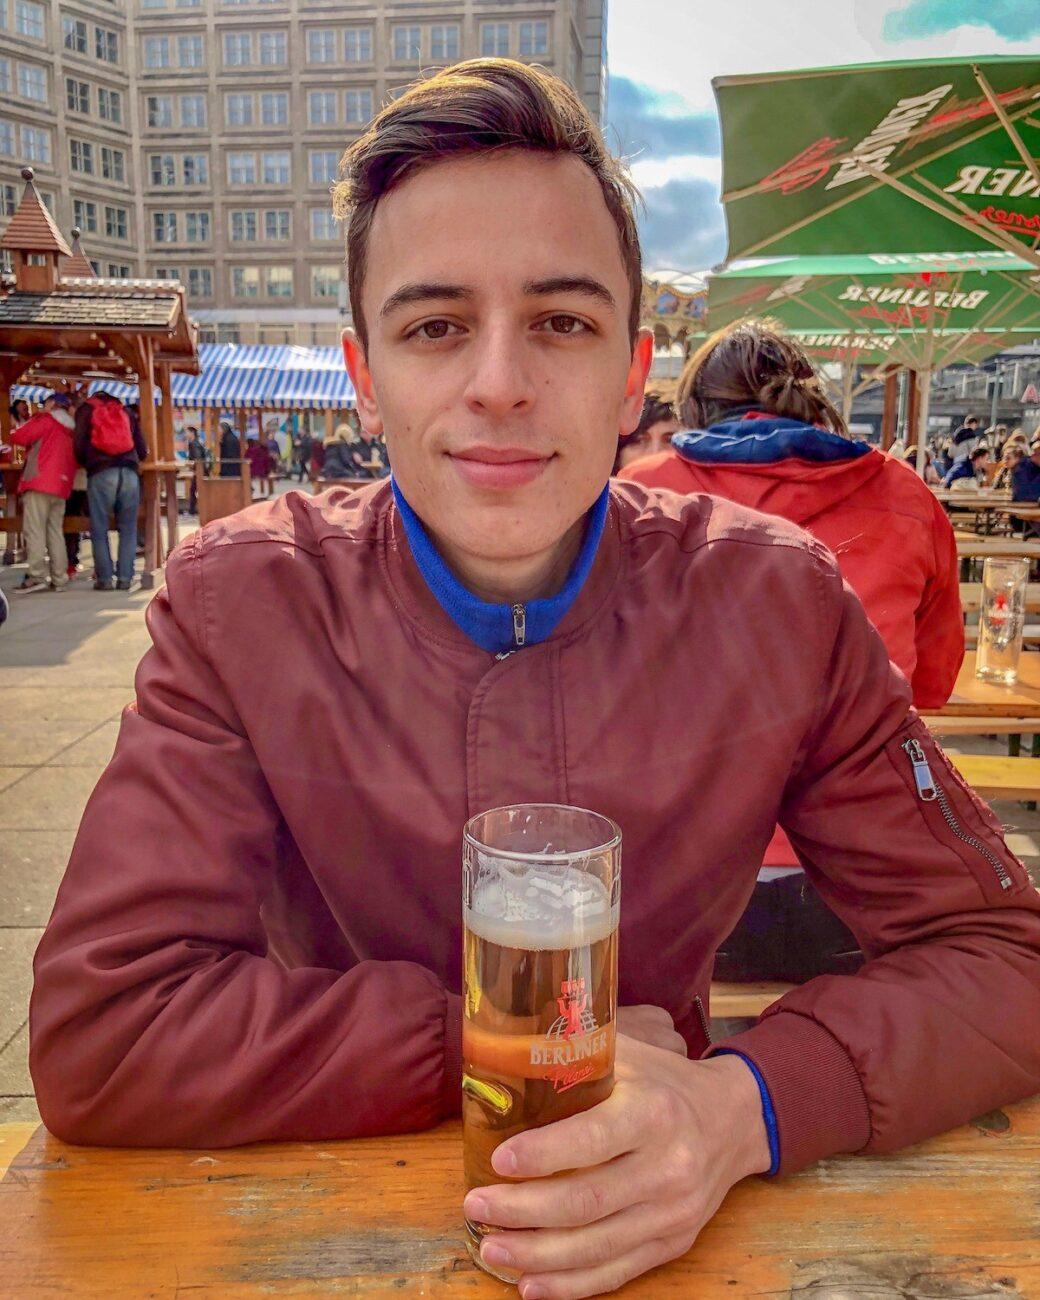 MOTM Jarrod West Frequent Flyer Points Berlin